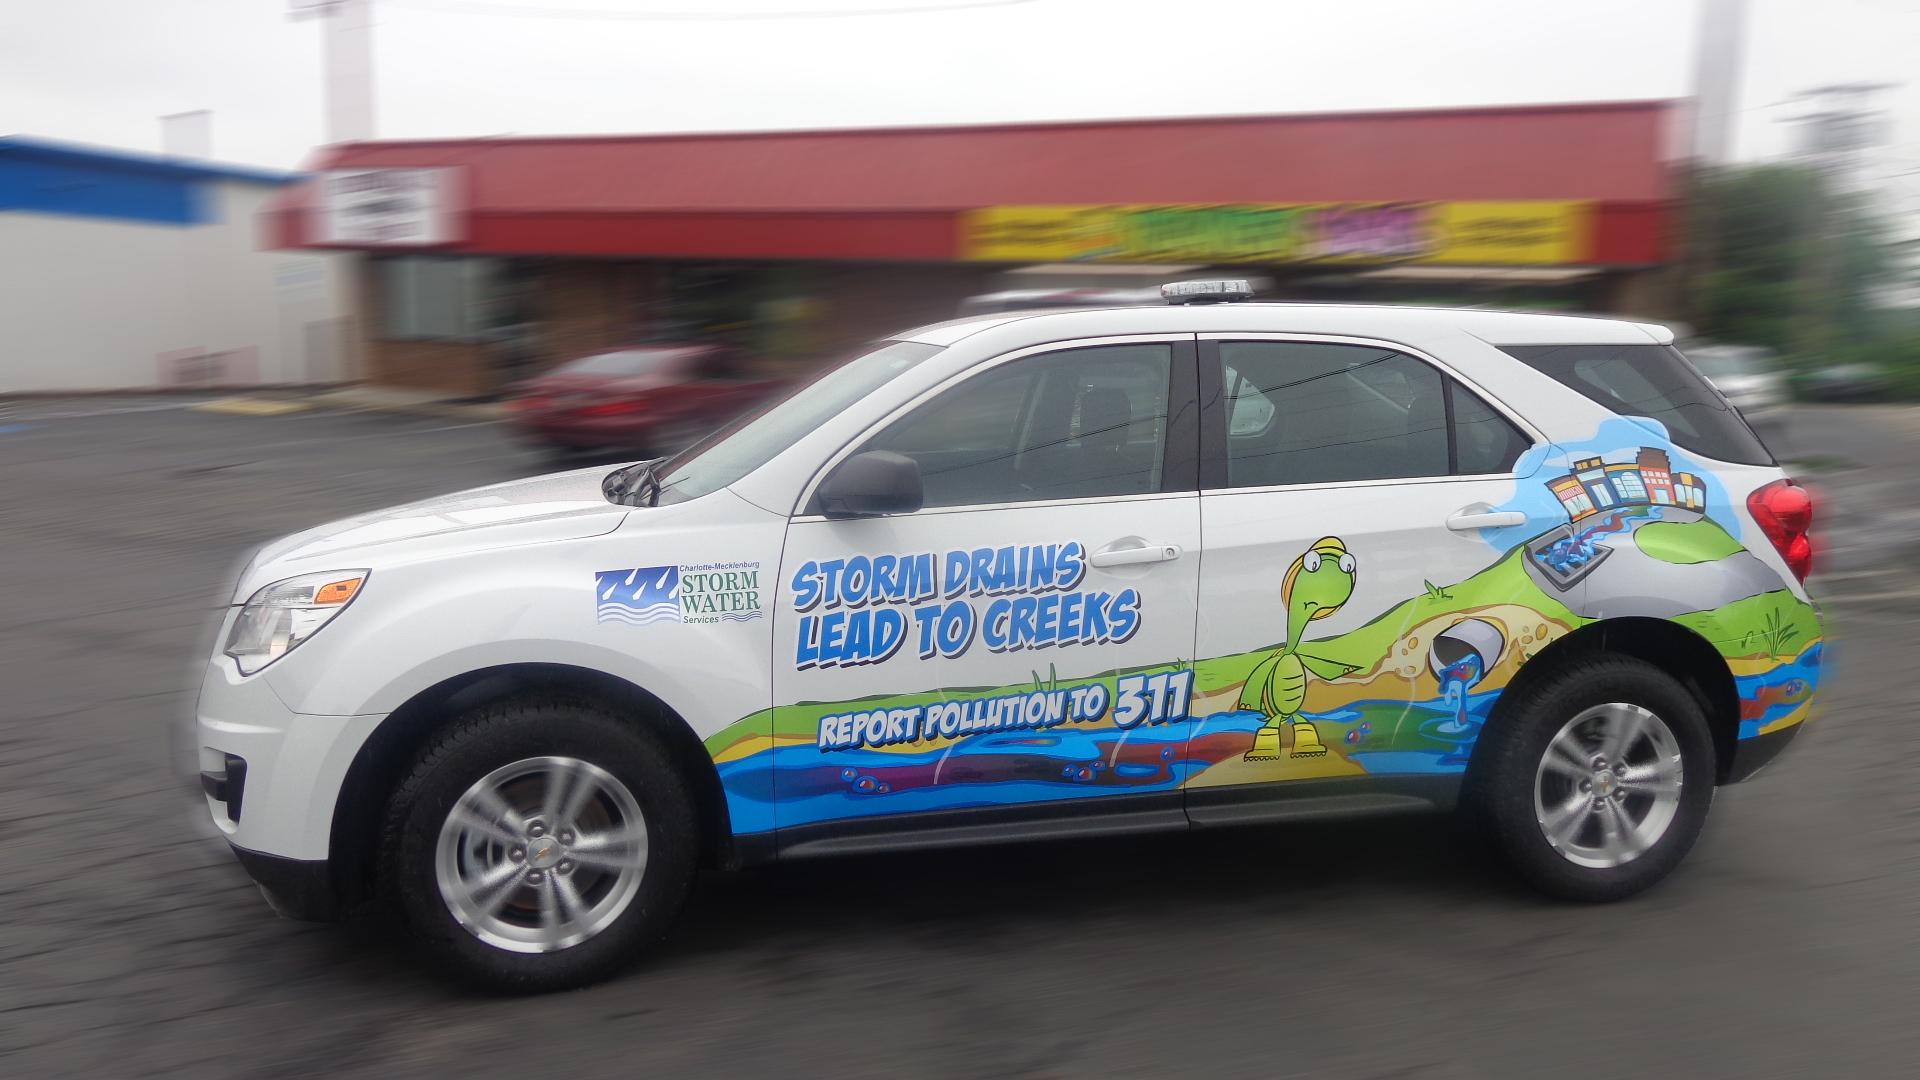 Kranken Signs Vehicle Wraps Charlotte image 9